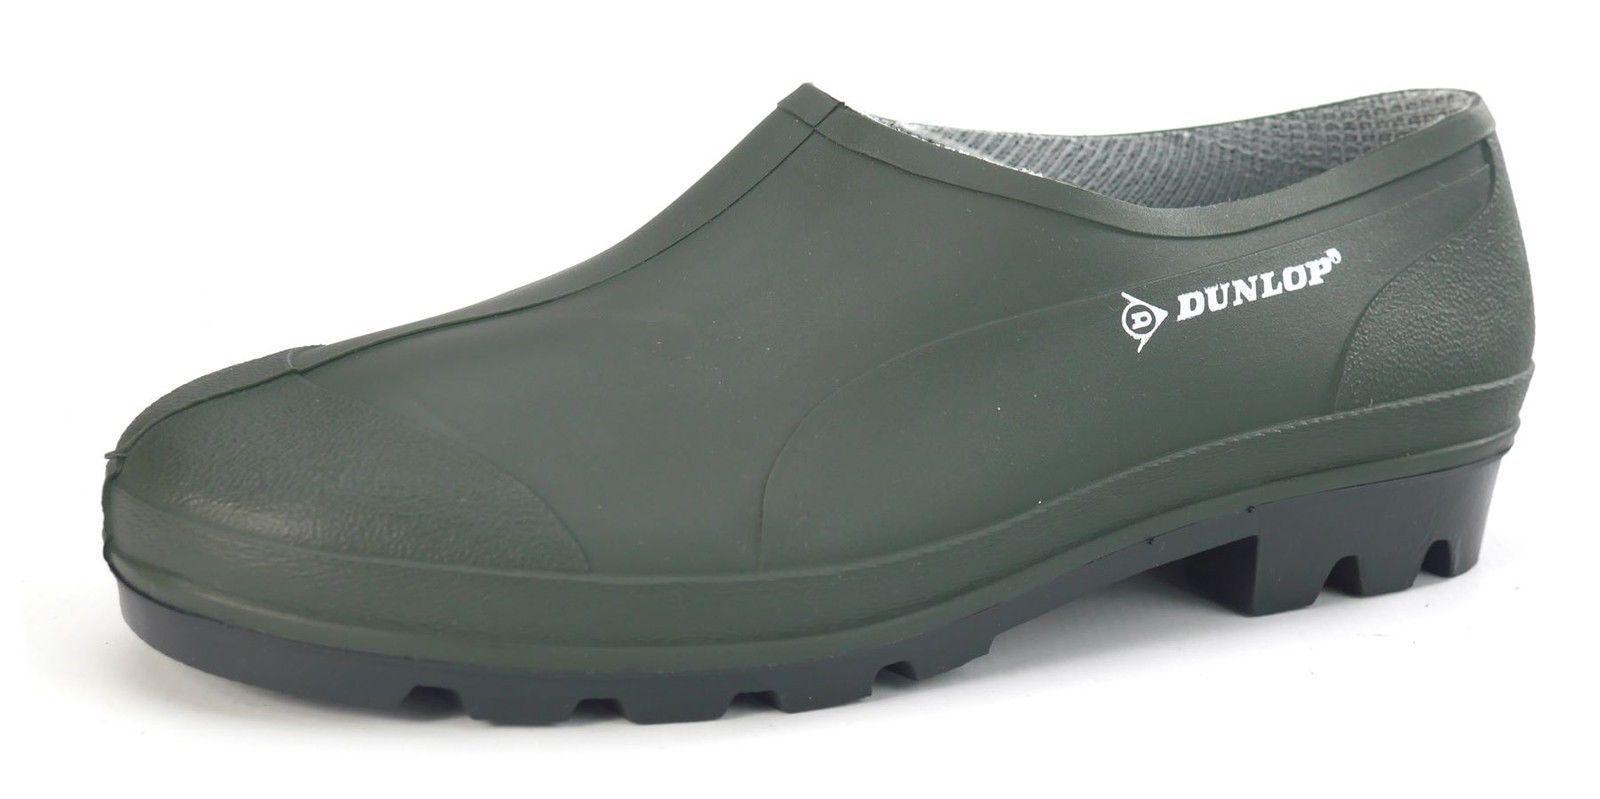 Neu Herren Damen Dunlop Gardner/' Unisex Garten Clogs Schuhe Gummistiefel Garten